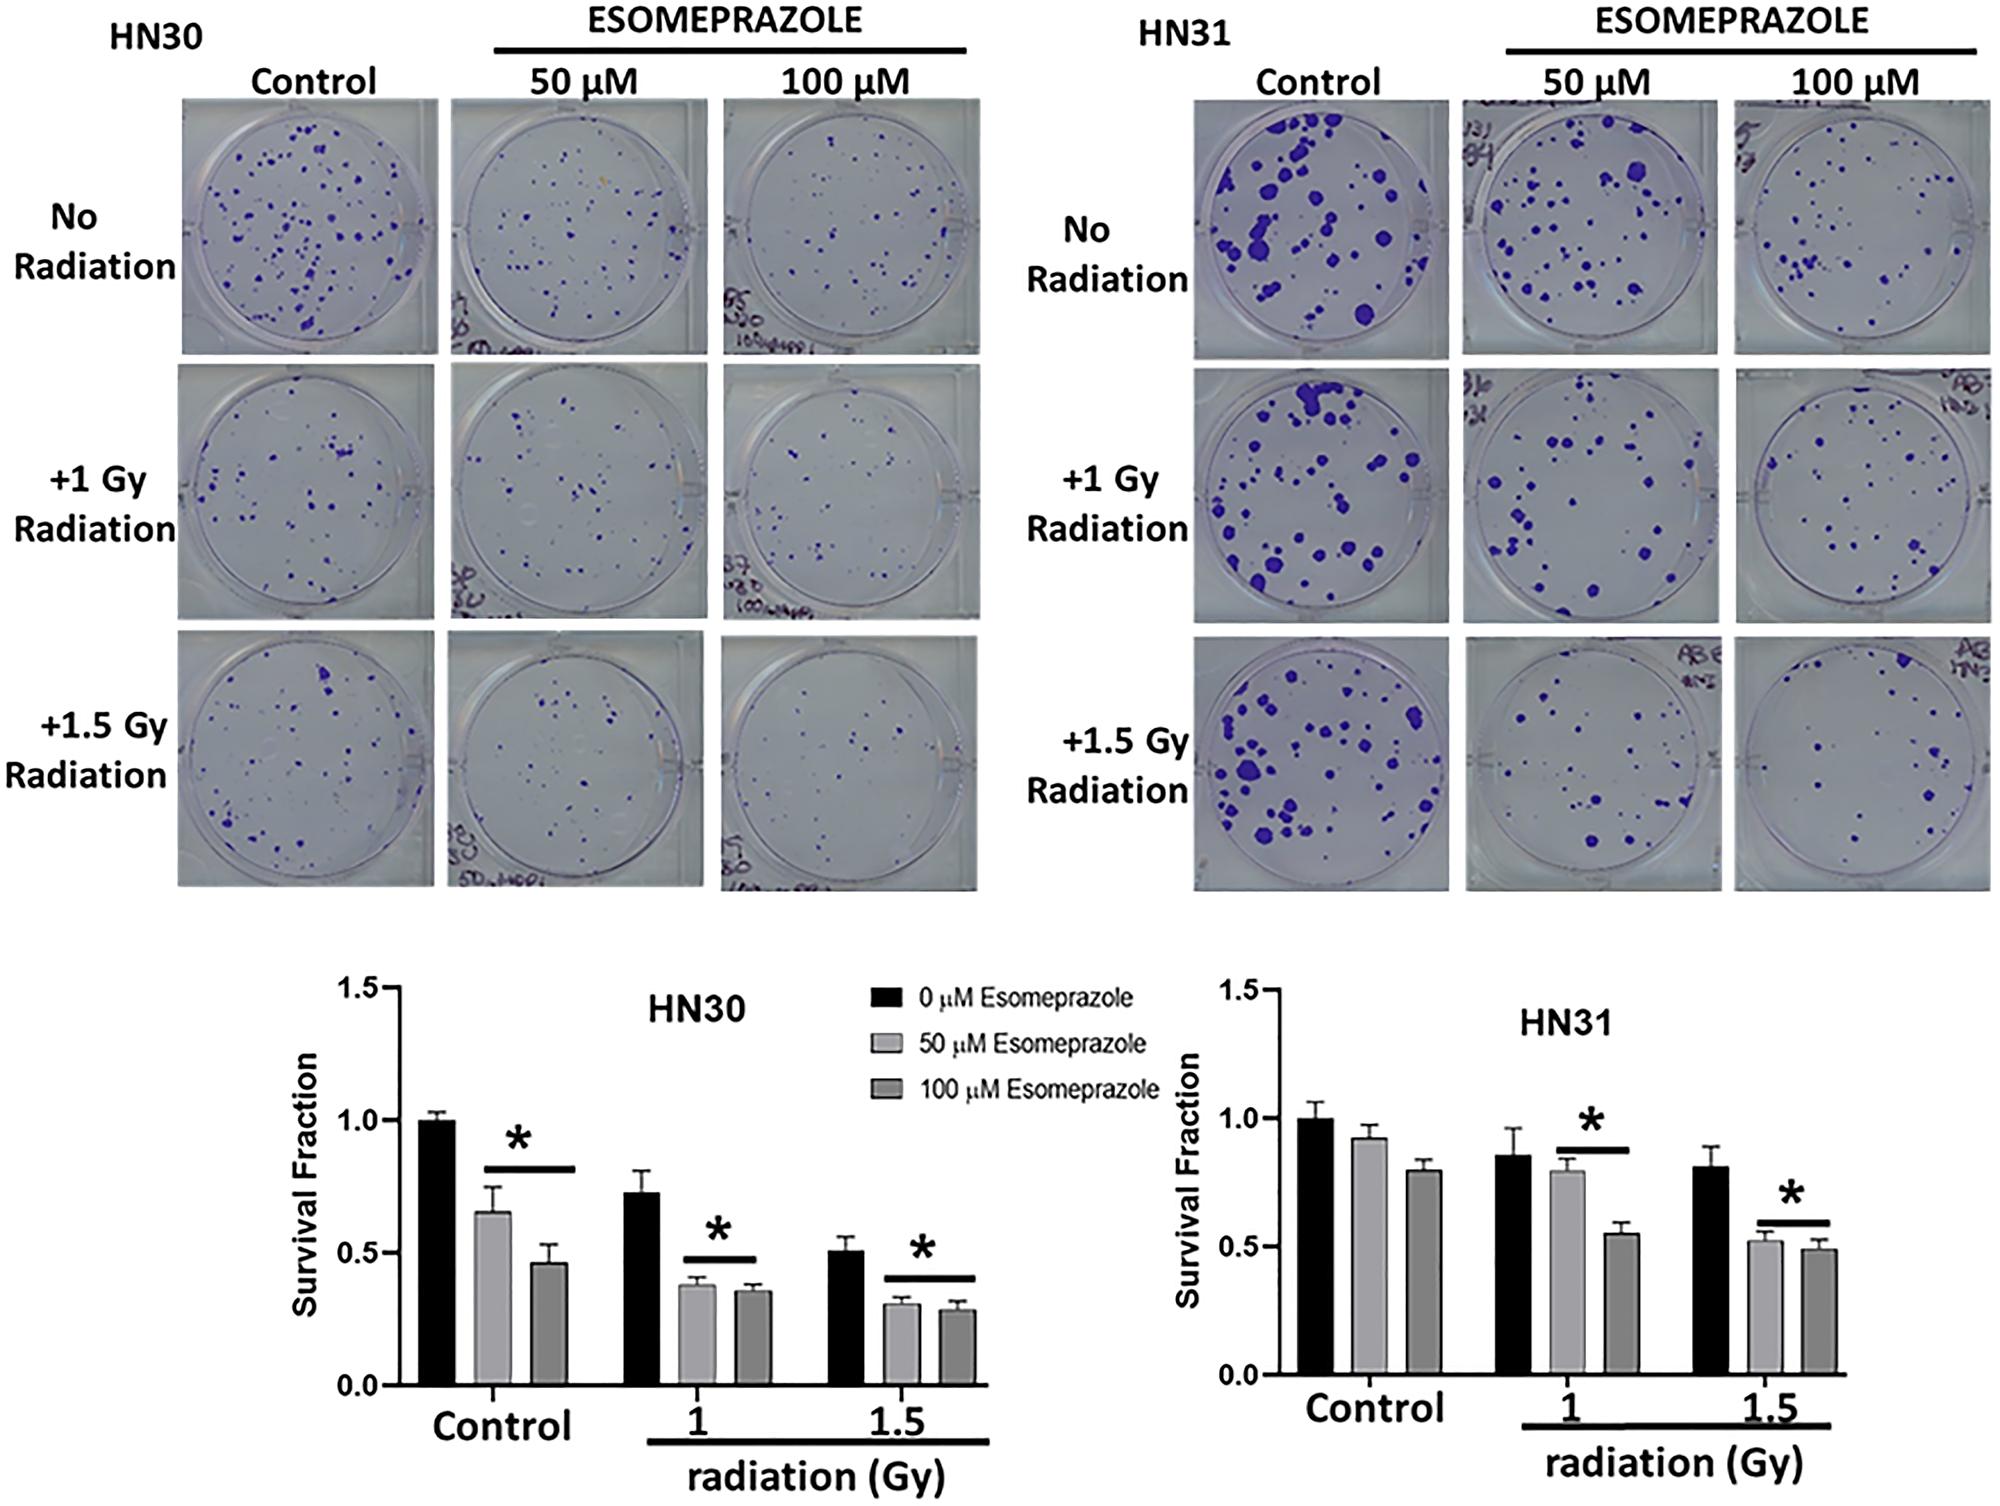 Esomeprazole enhances the effect of radiation to improve tumor control in vitro.